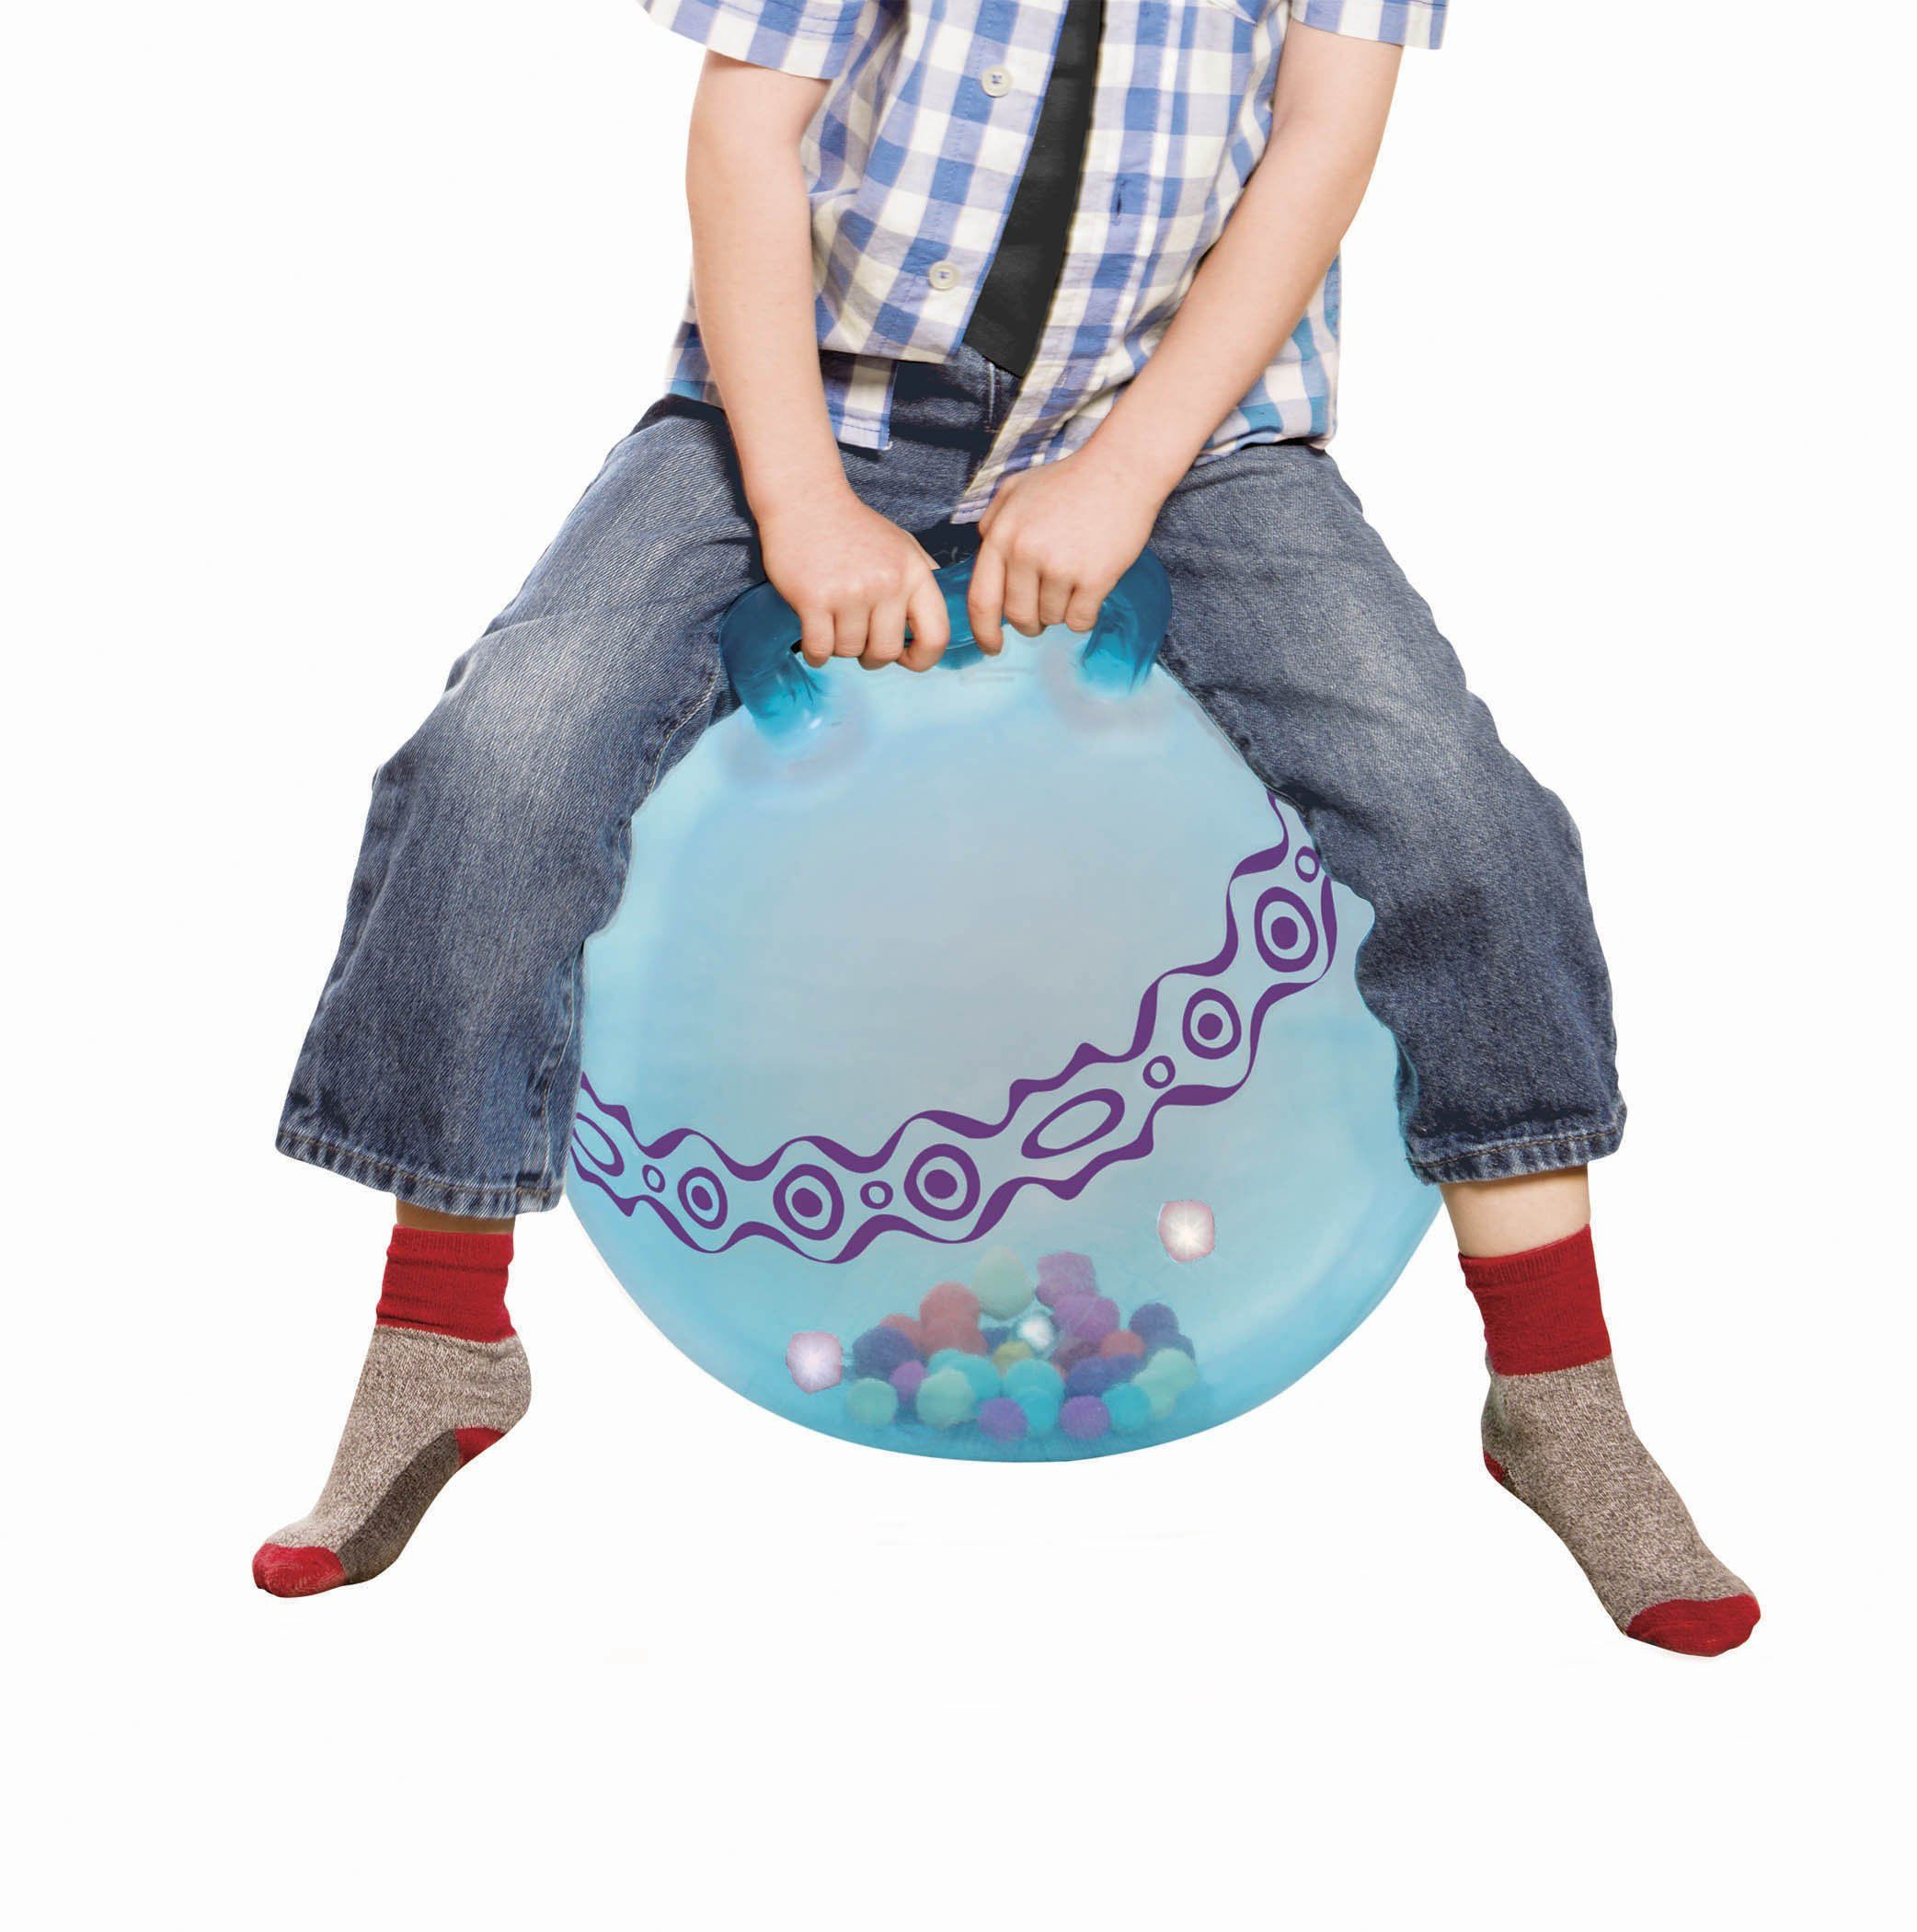 B. toys by Battat 44629 (Sea) Light-Up Hopping Ball